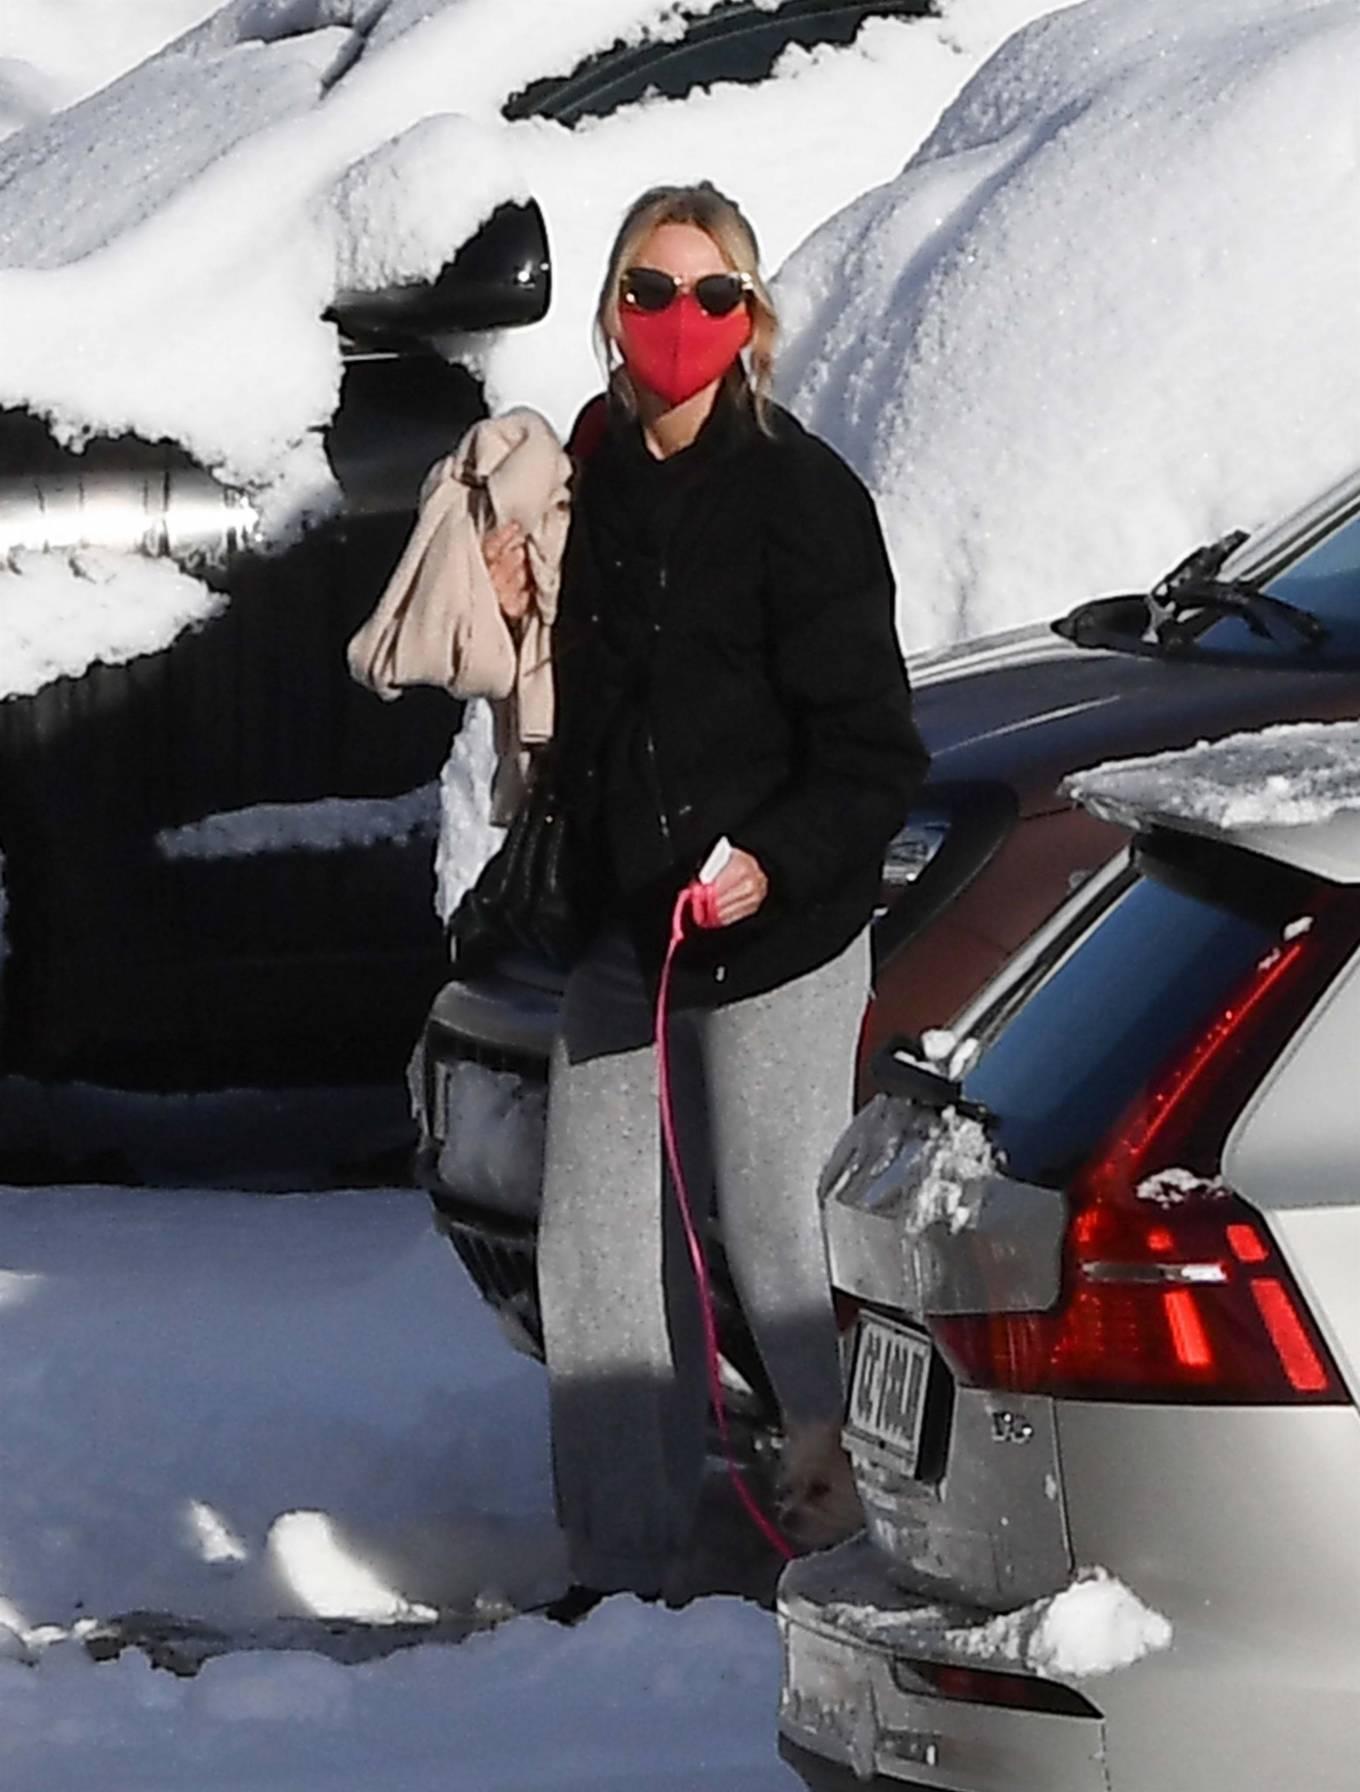 Naomi Watts and Liev Schreiber - At the ski resort of Cortina d'Ampezzo - Italy